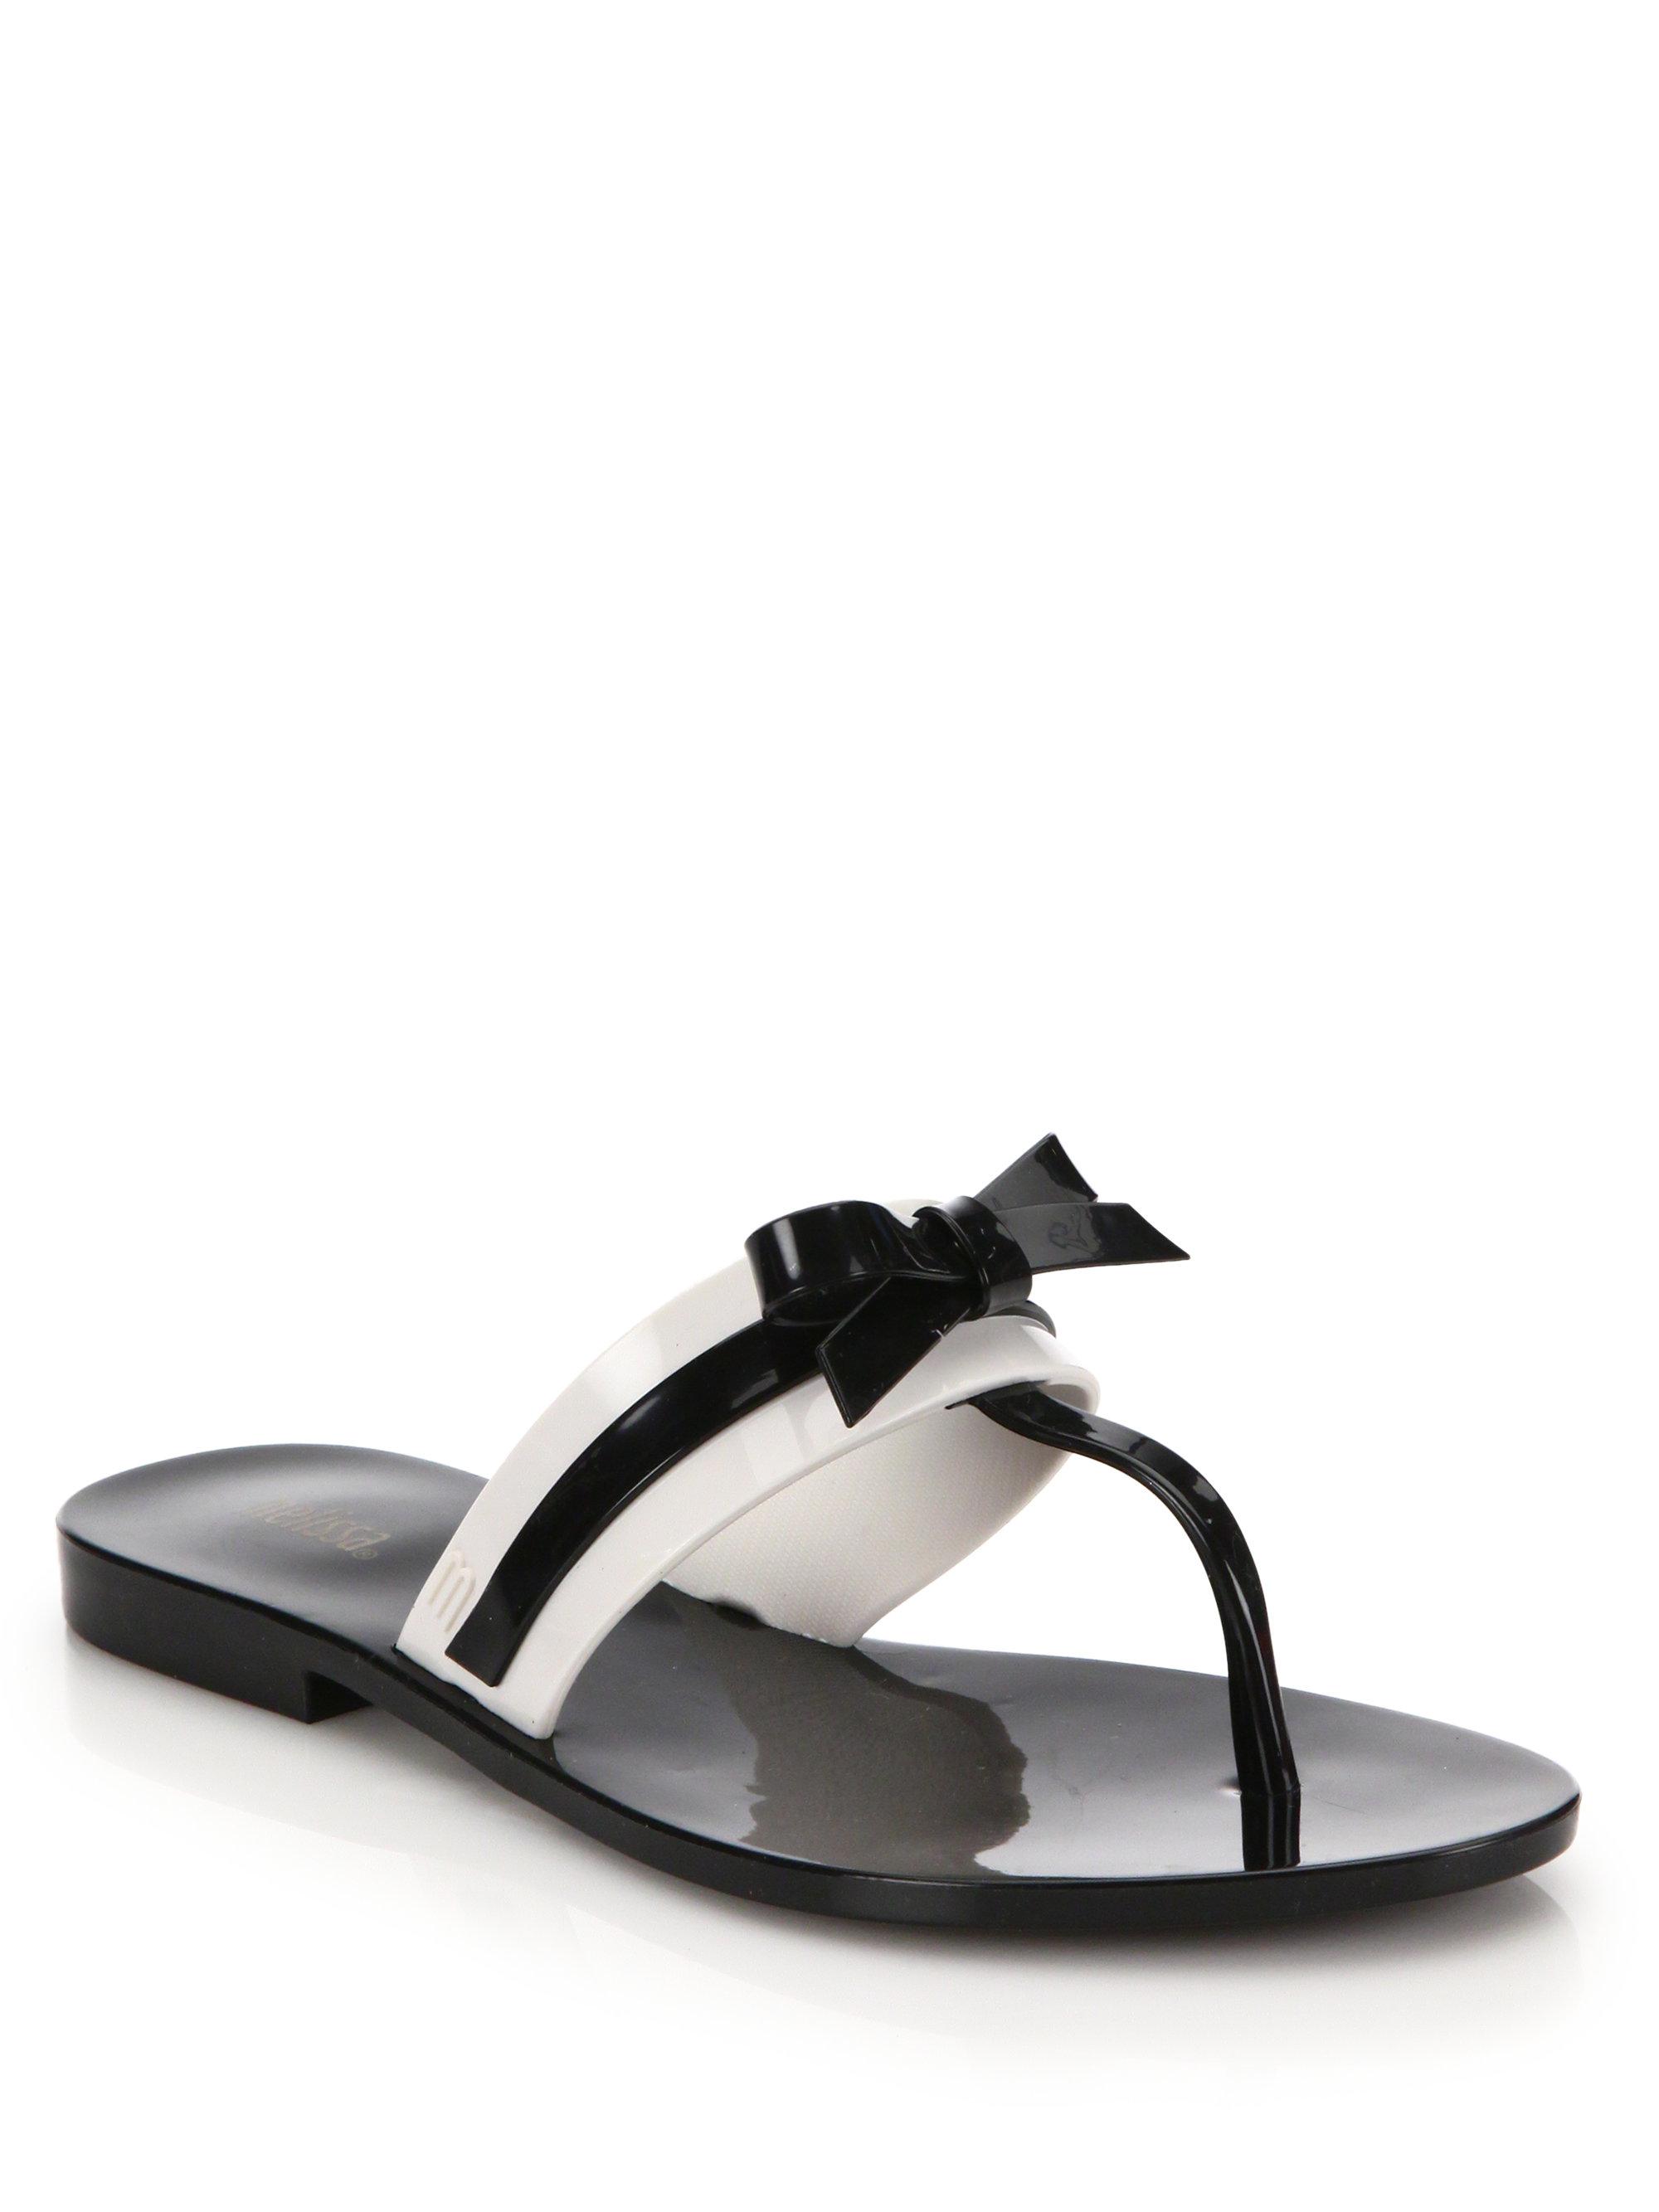 25457ee0cf51d2 Lyst - Melissa Garota T-strap Bow Sandals in Black